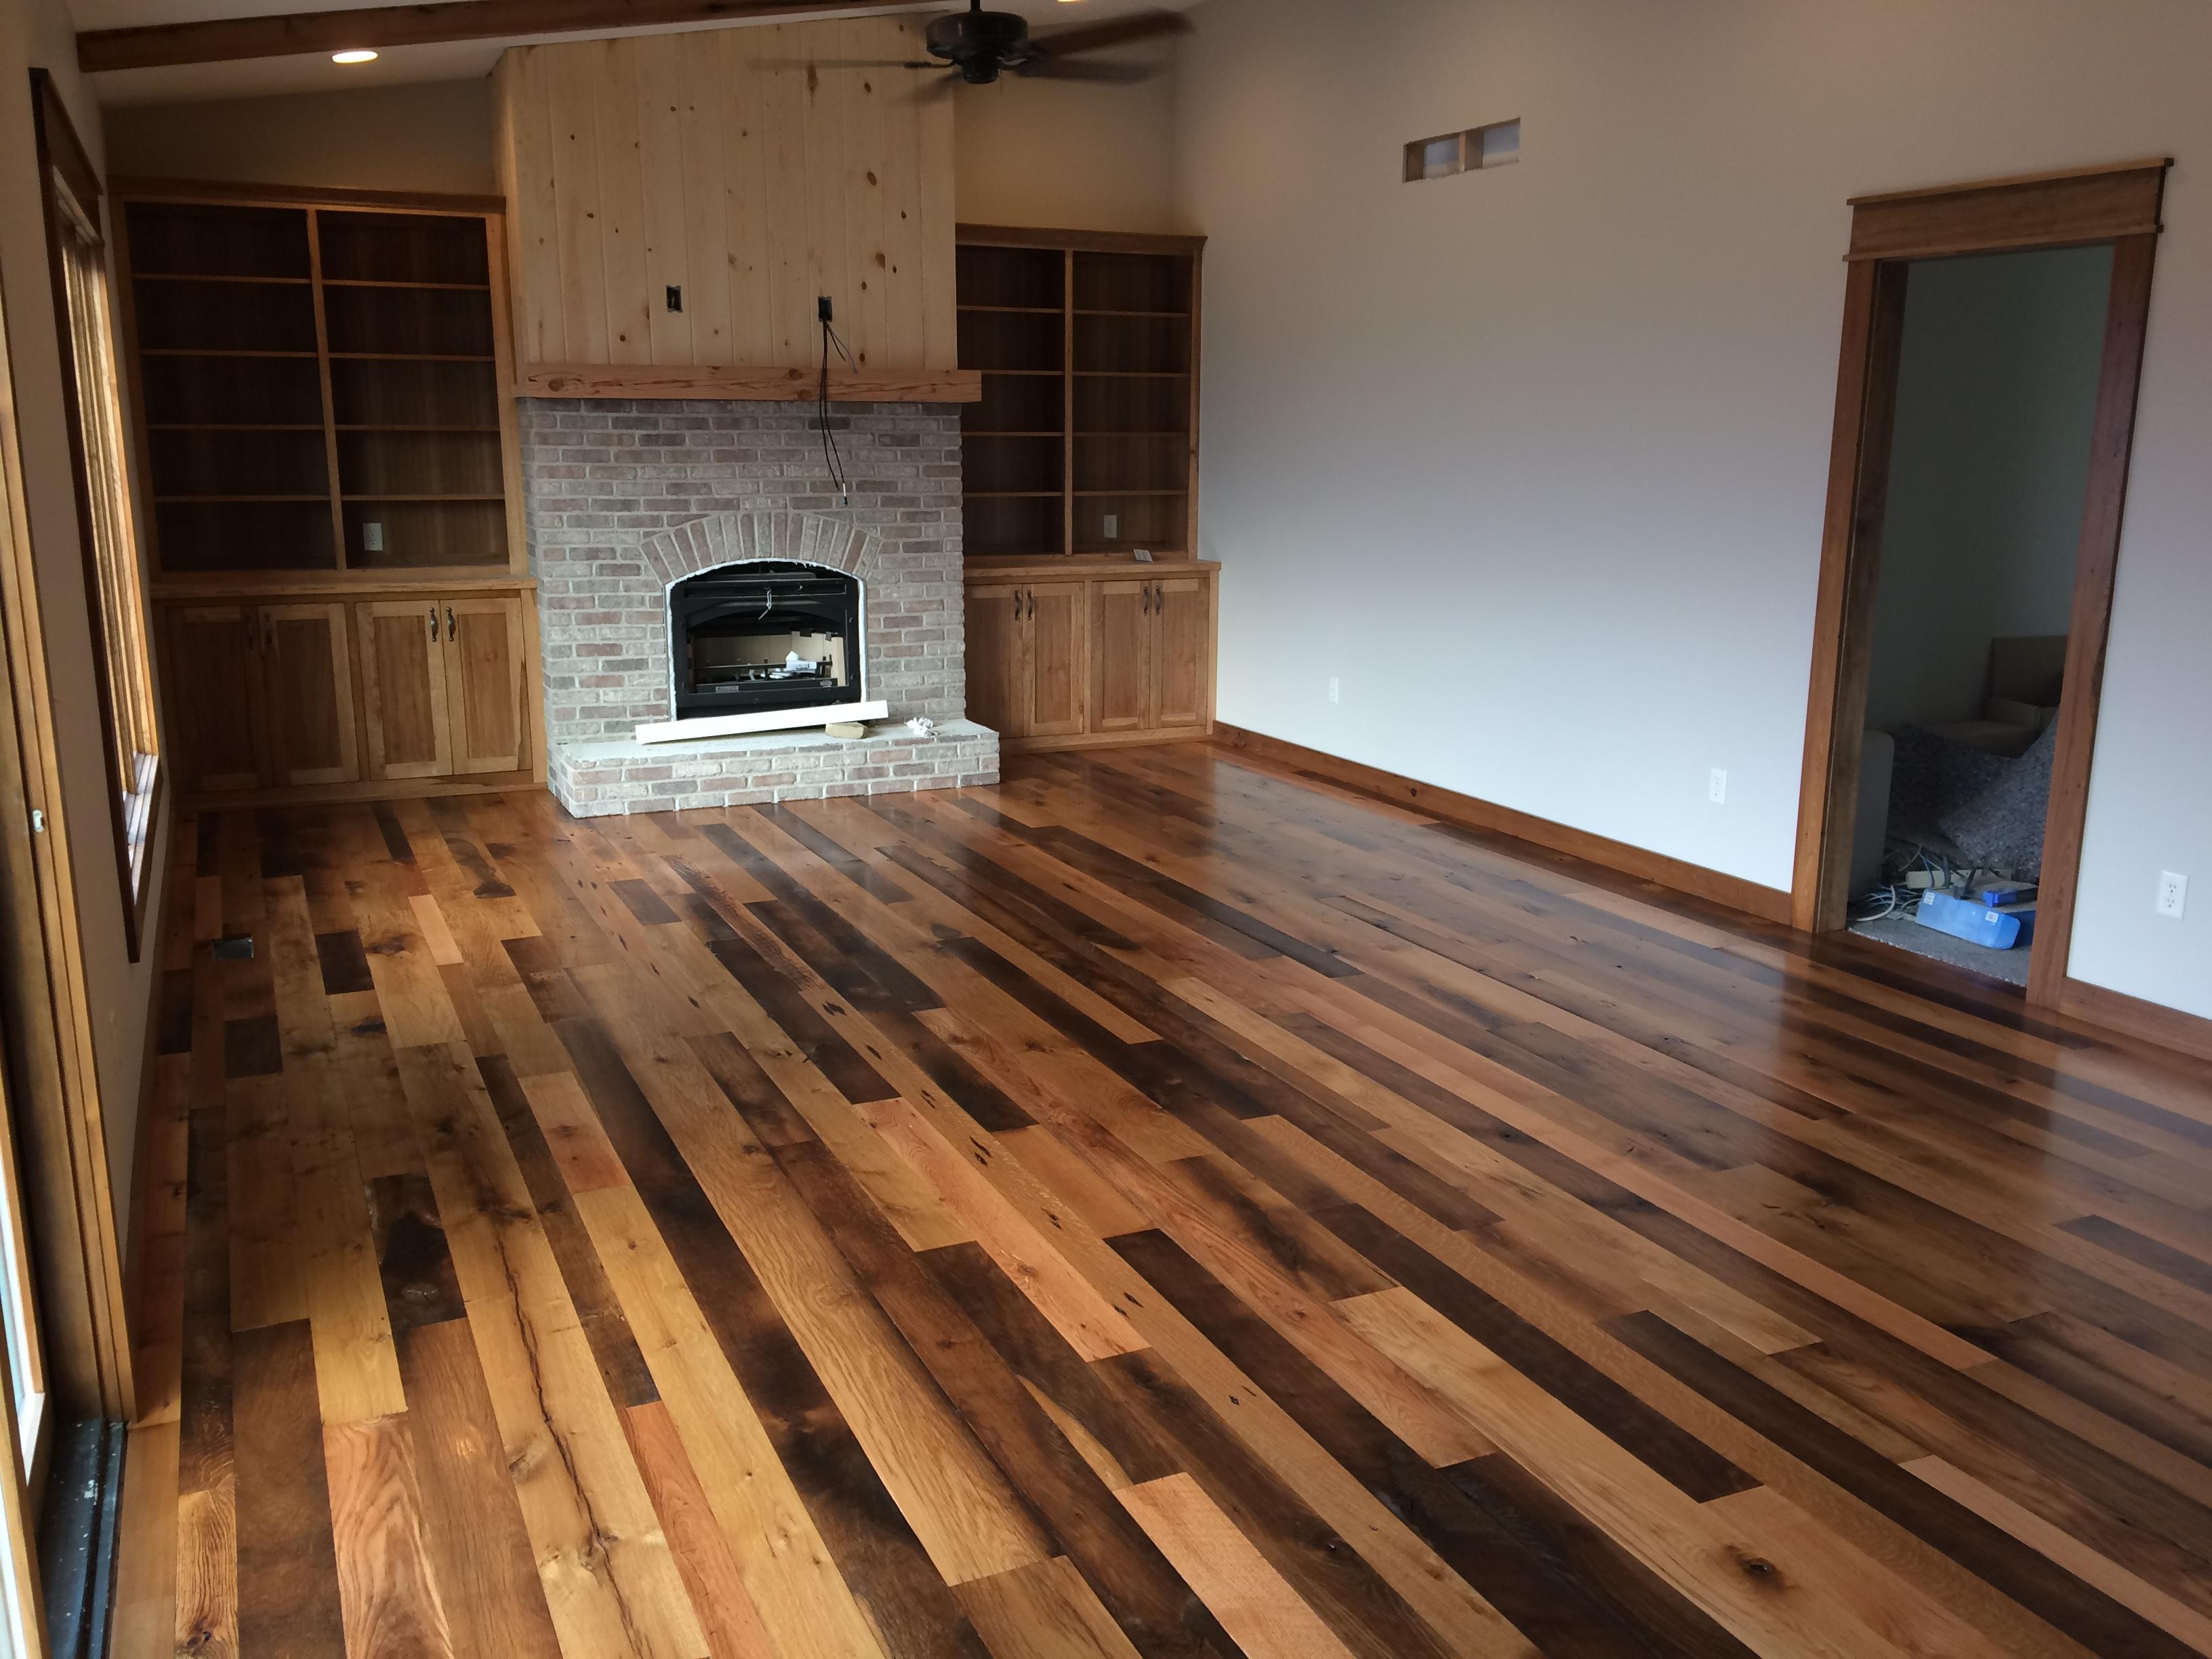 Hardwood floor refinishing picture of sanded and refinished wood flooring, professional hardwood floor refinishing